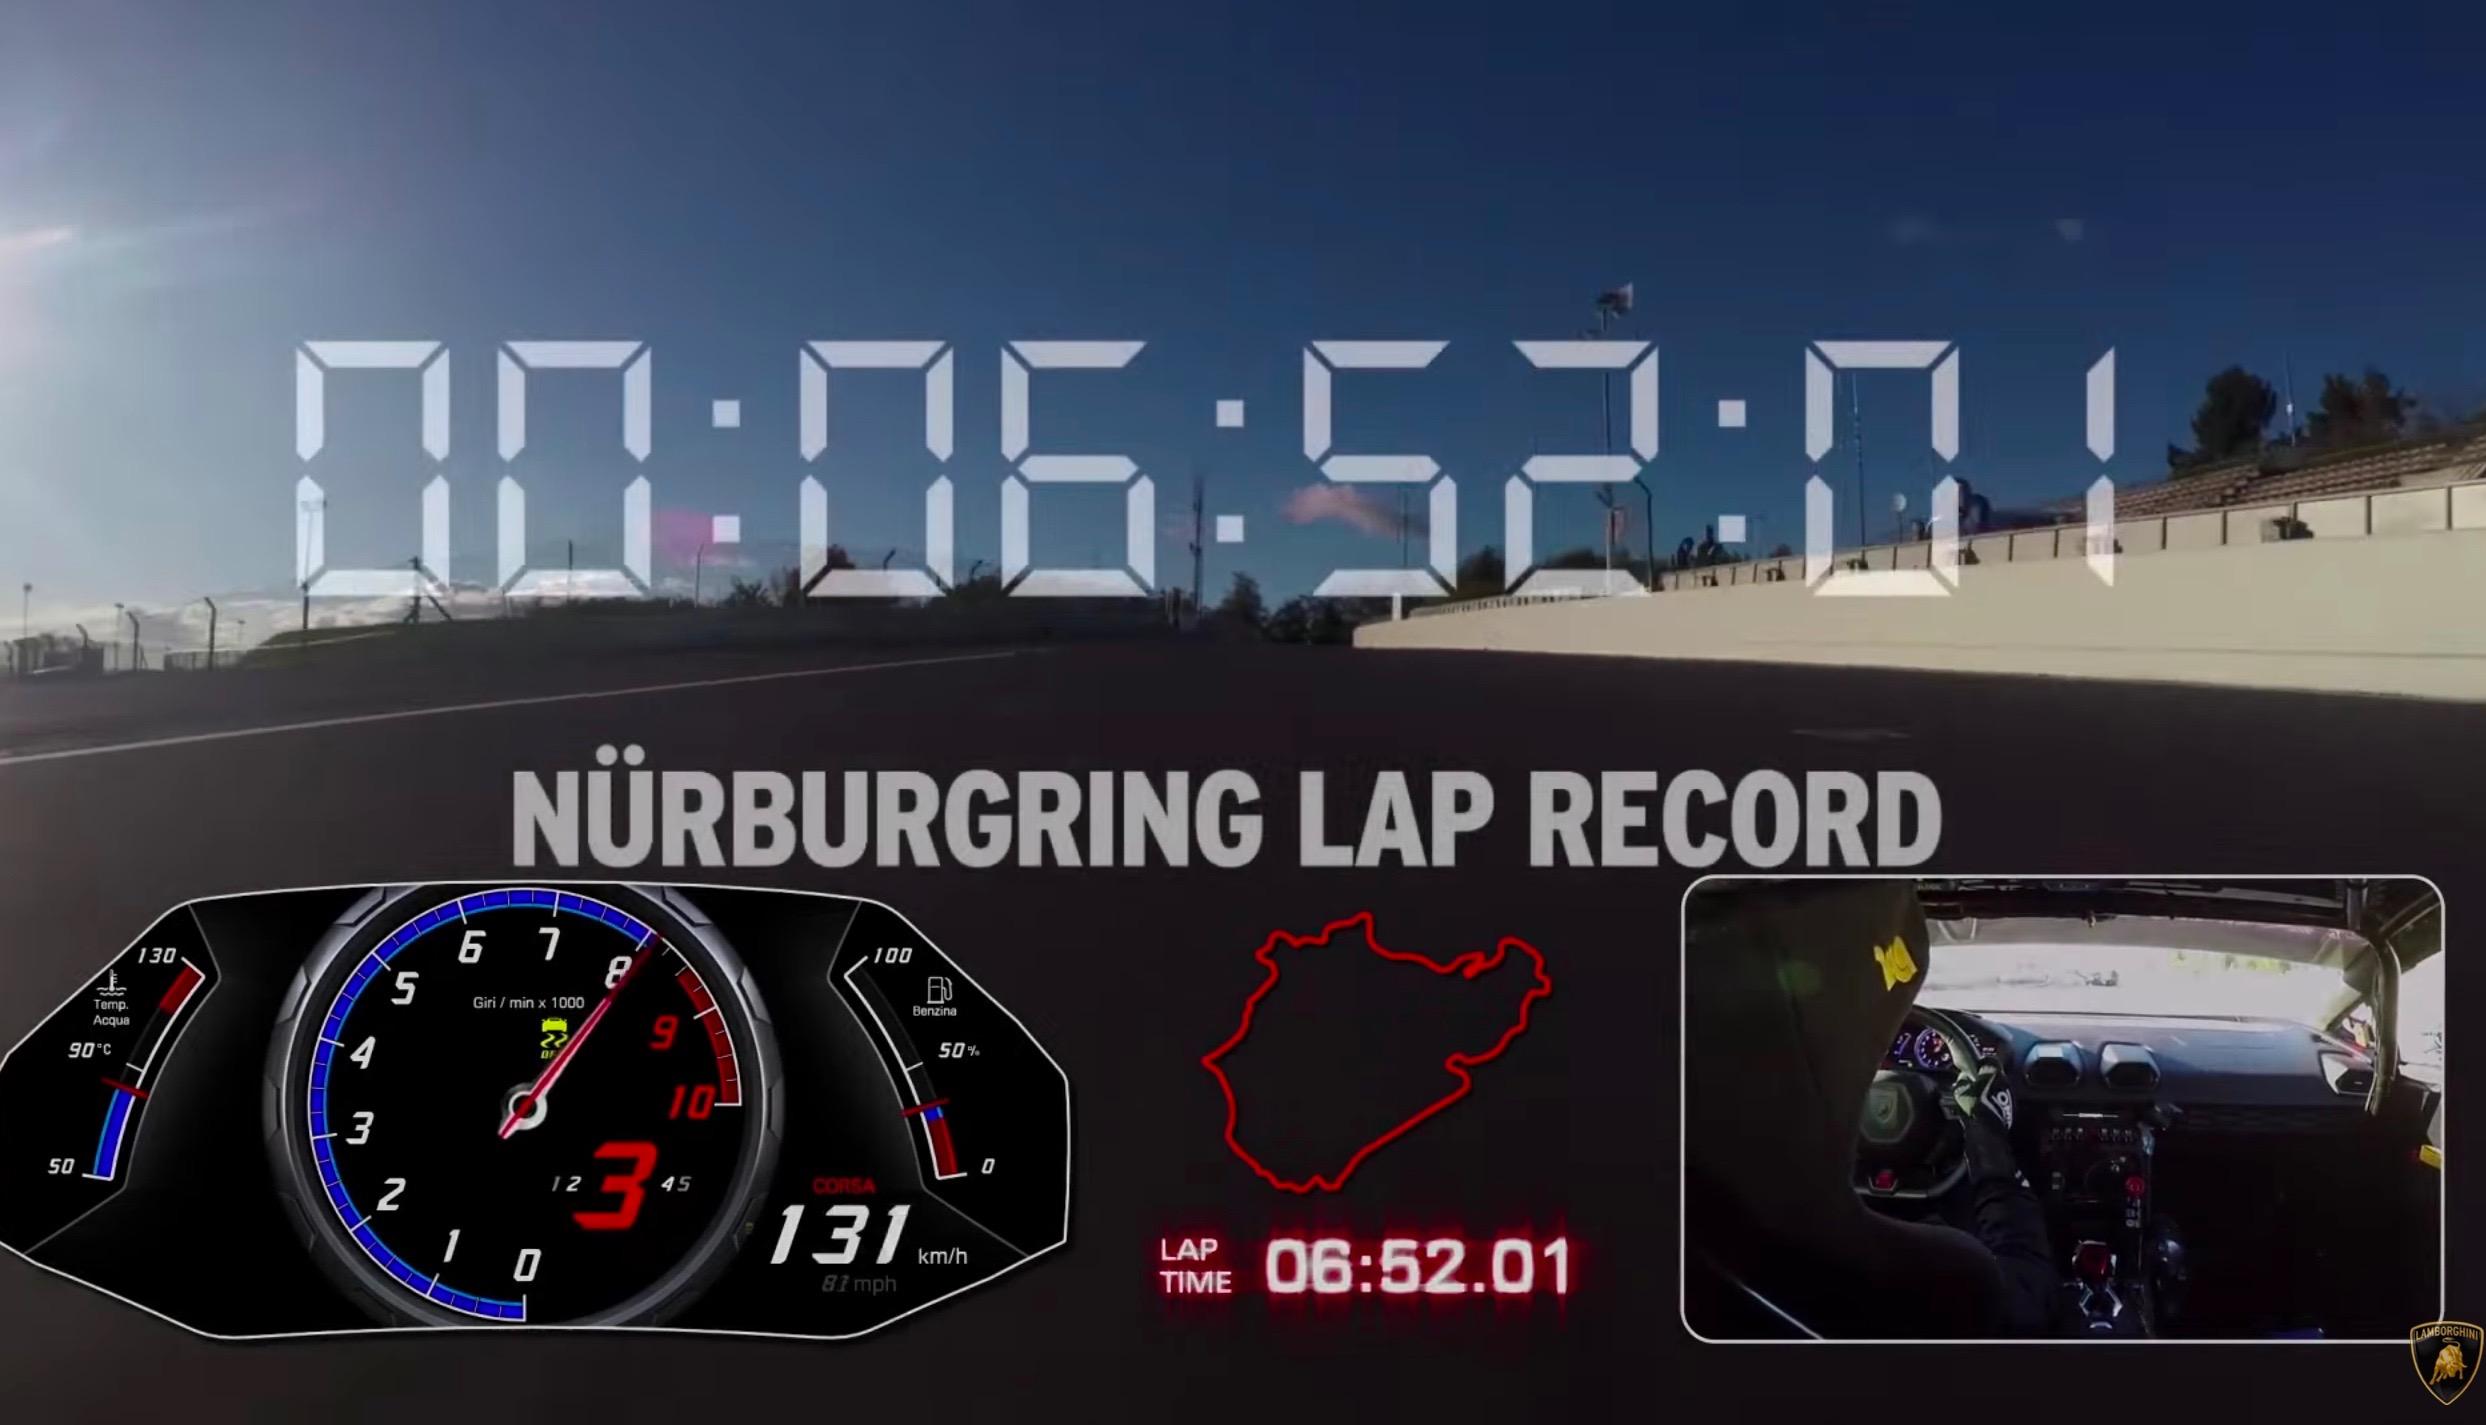 Lamborghini Huracan Performante sets Nurburgring lap record